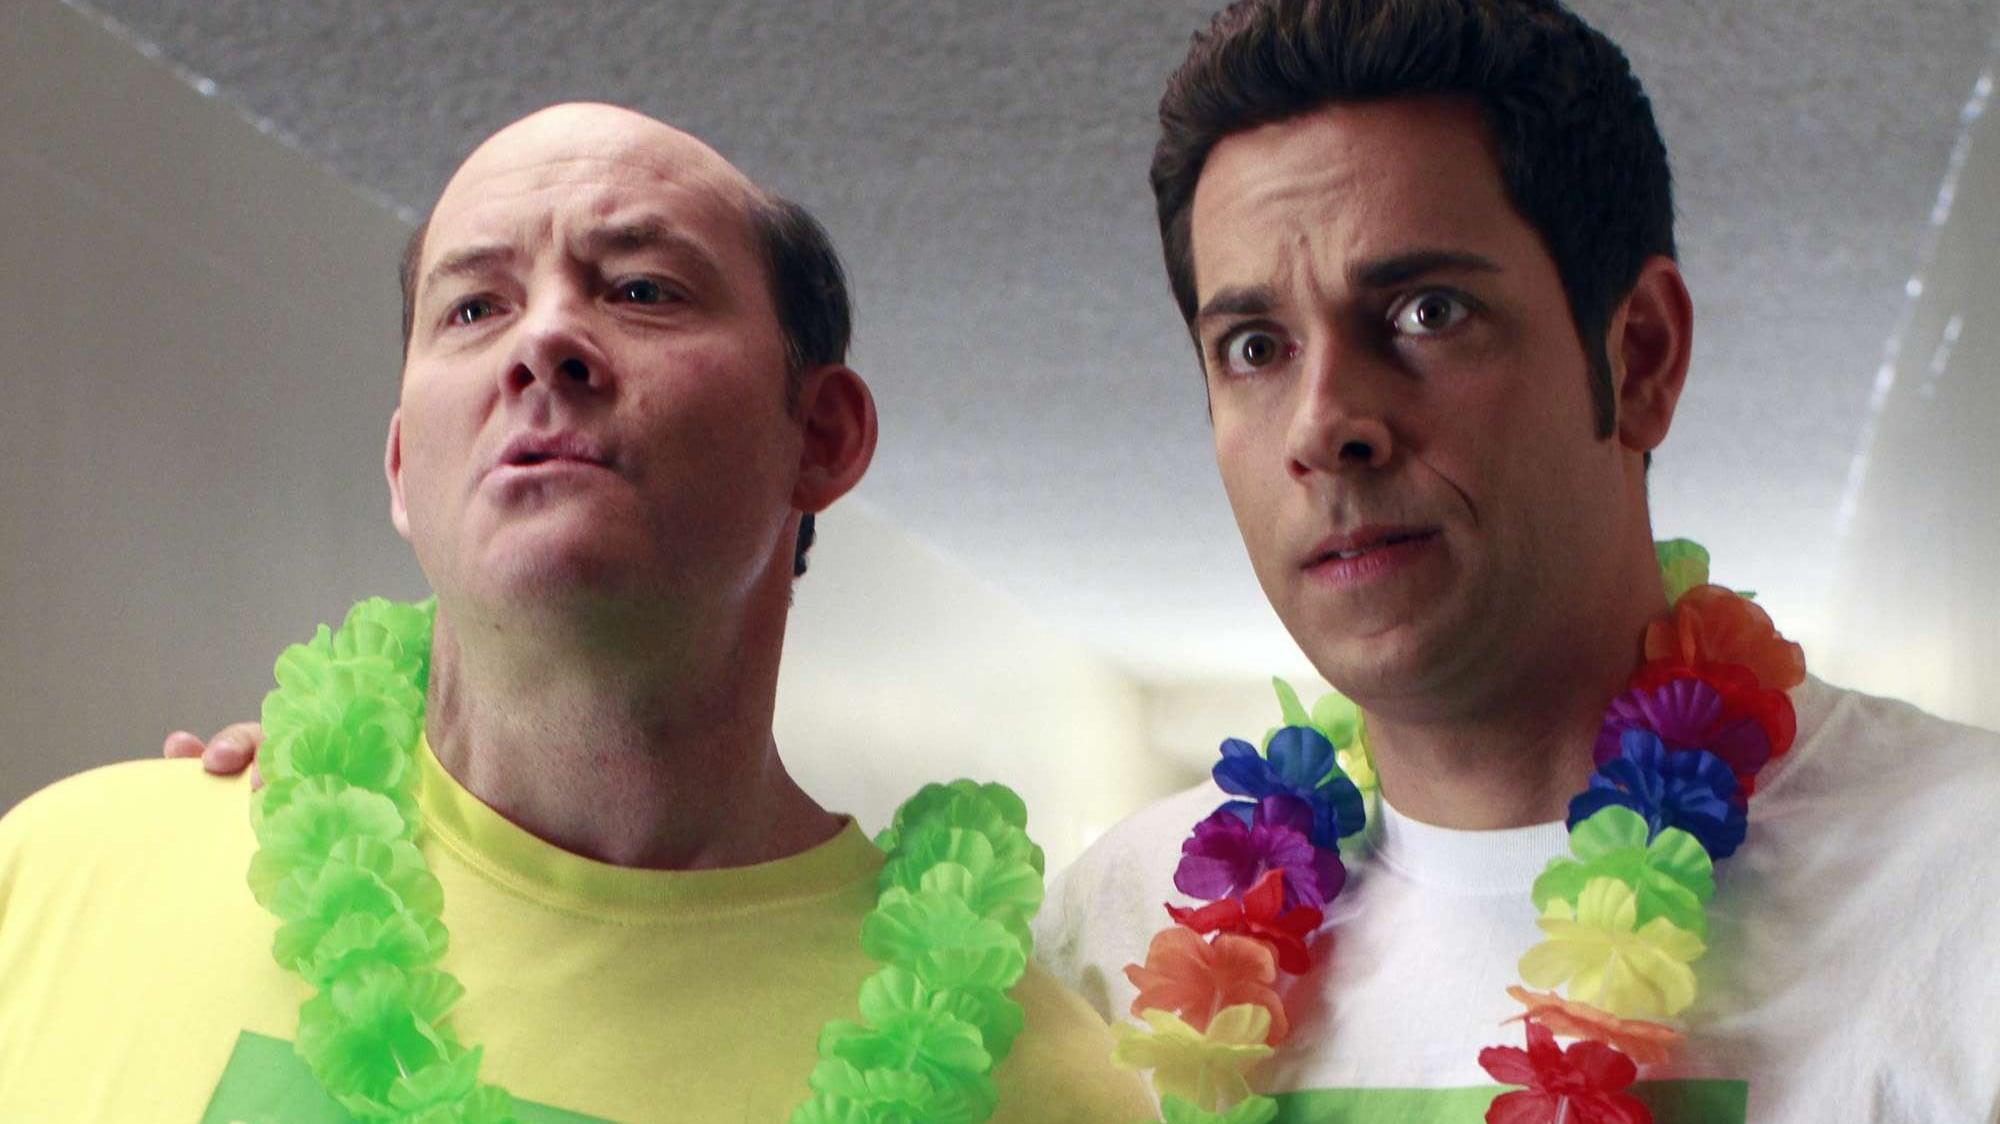 chuck season 4 episode 13 coke and popcorn